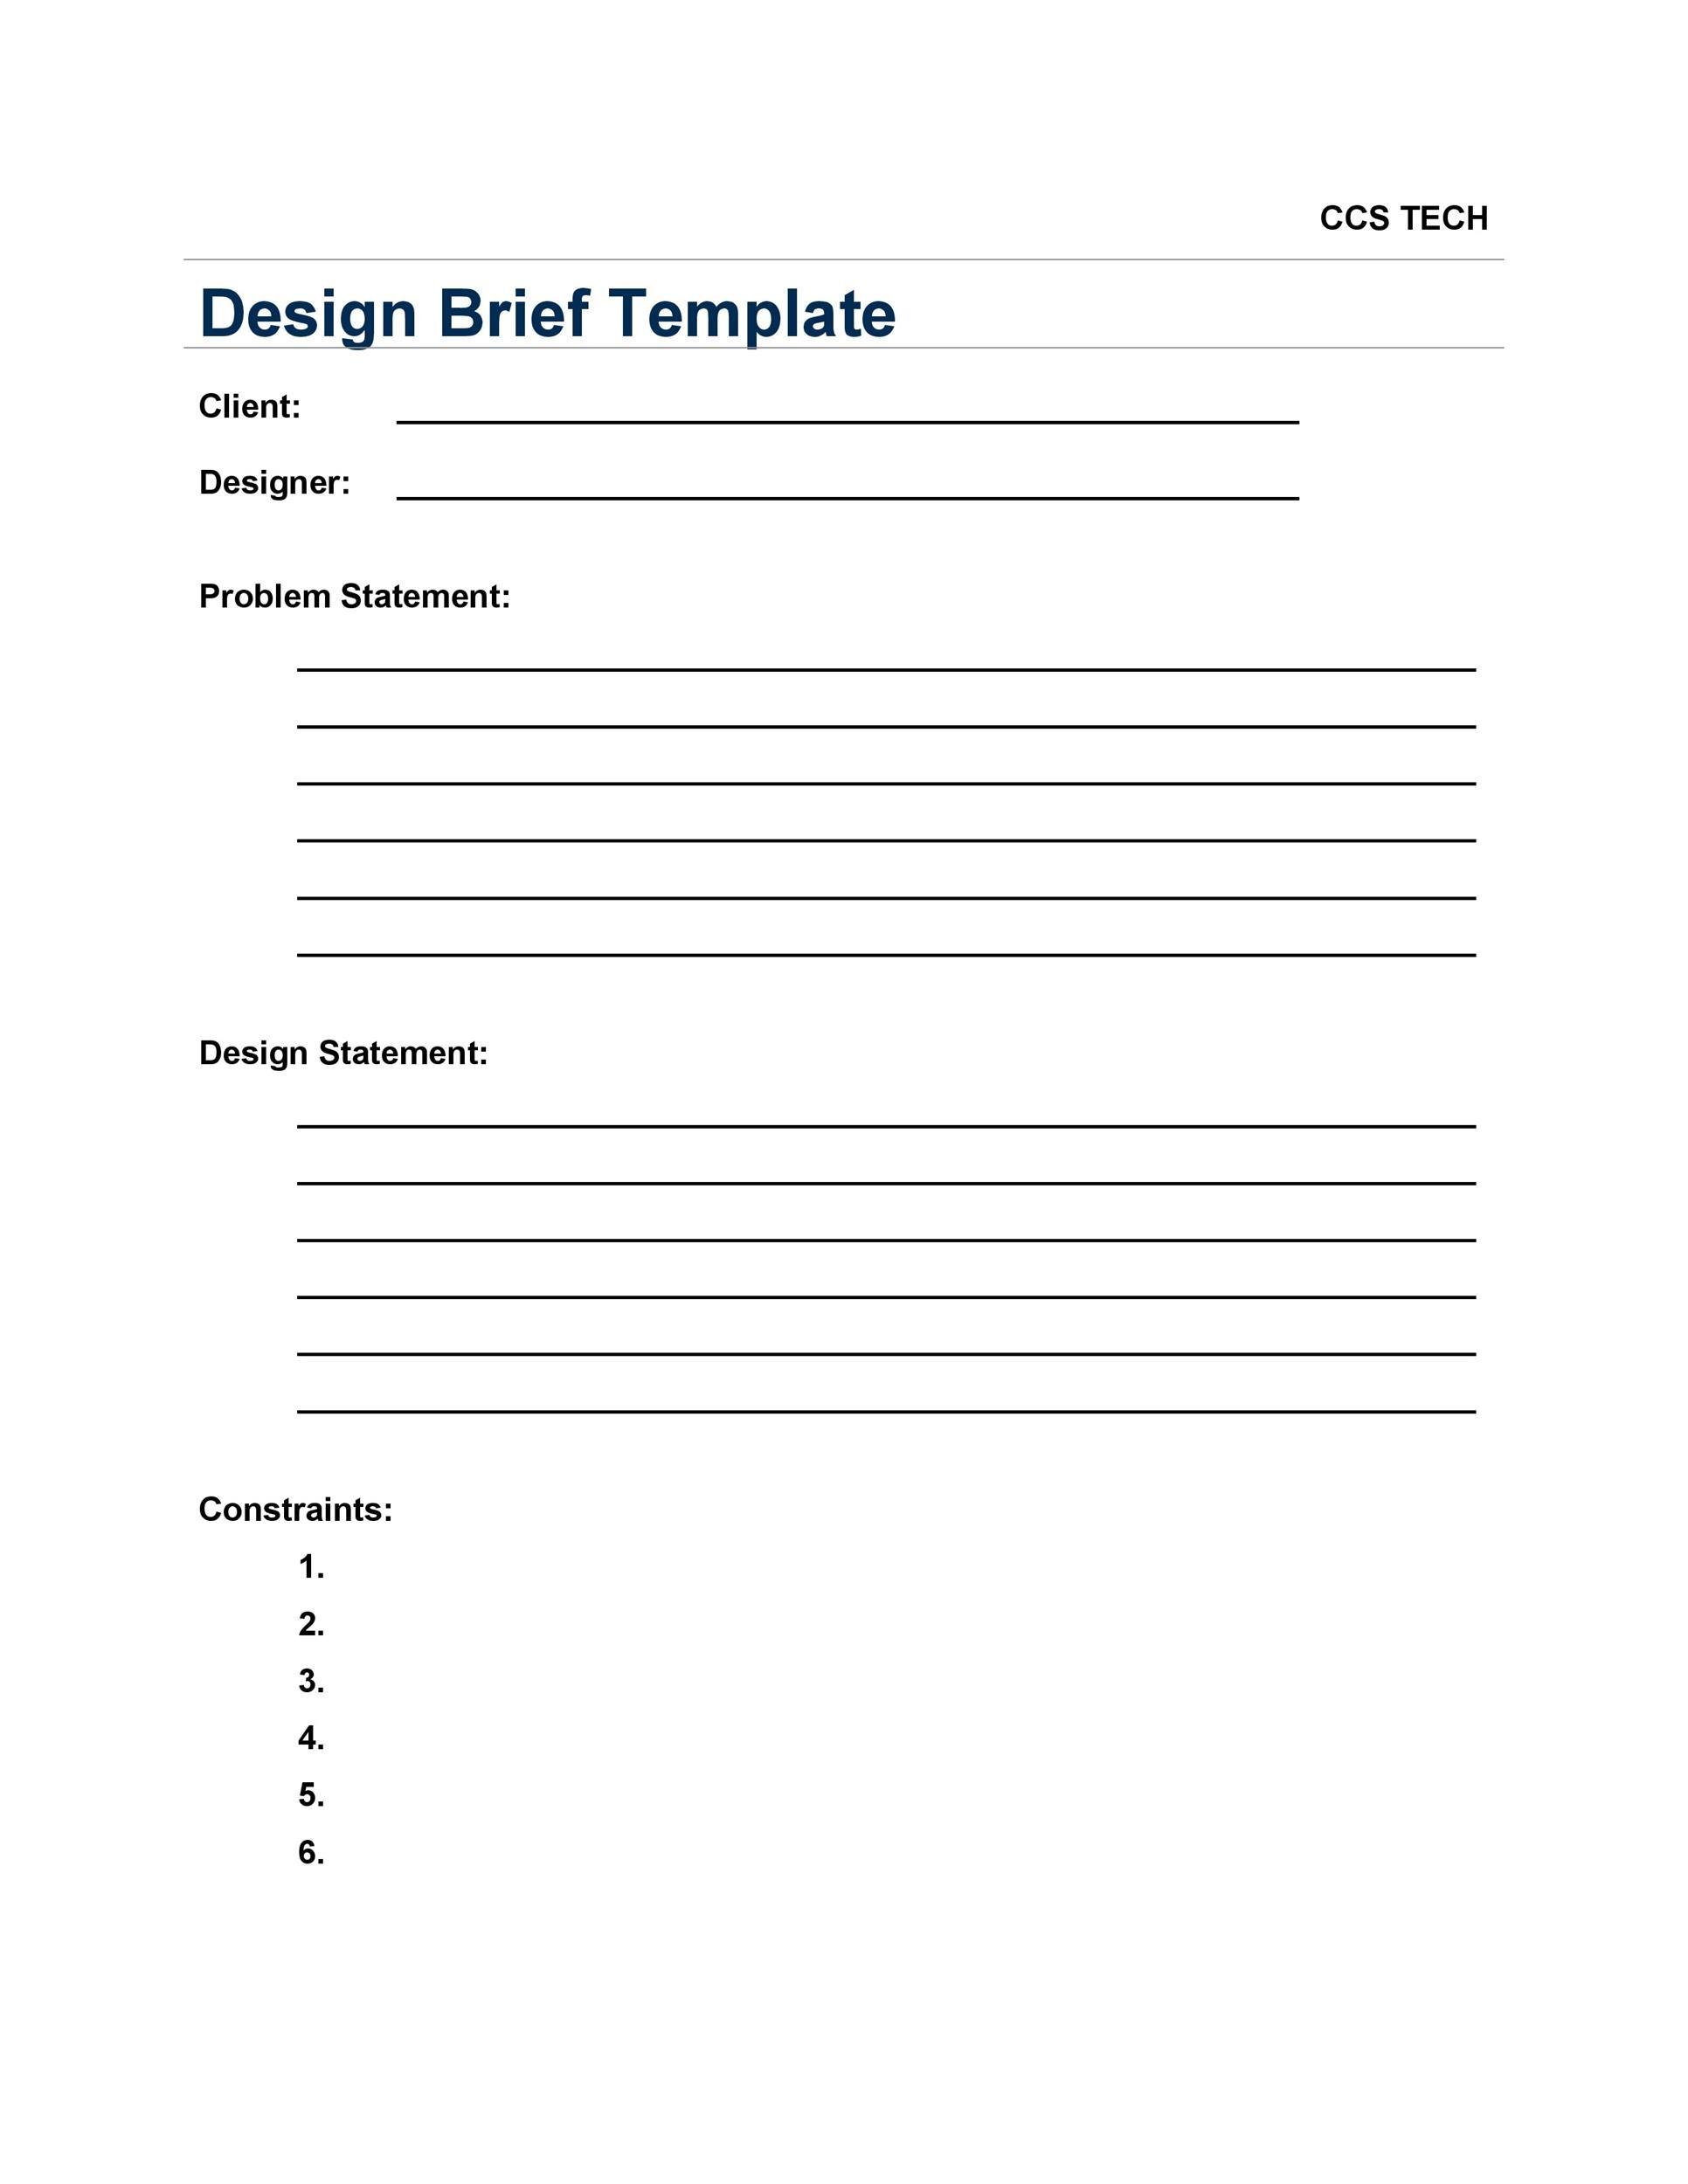 Free design brief template 26